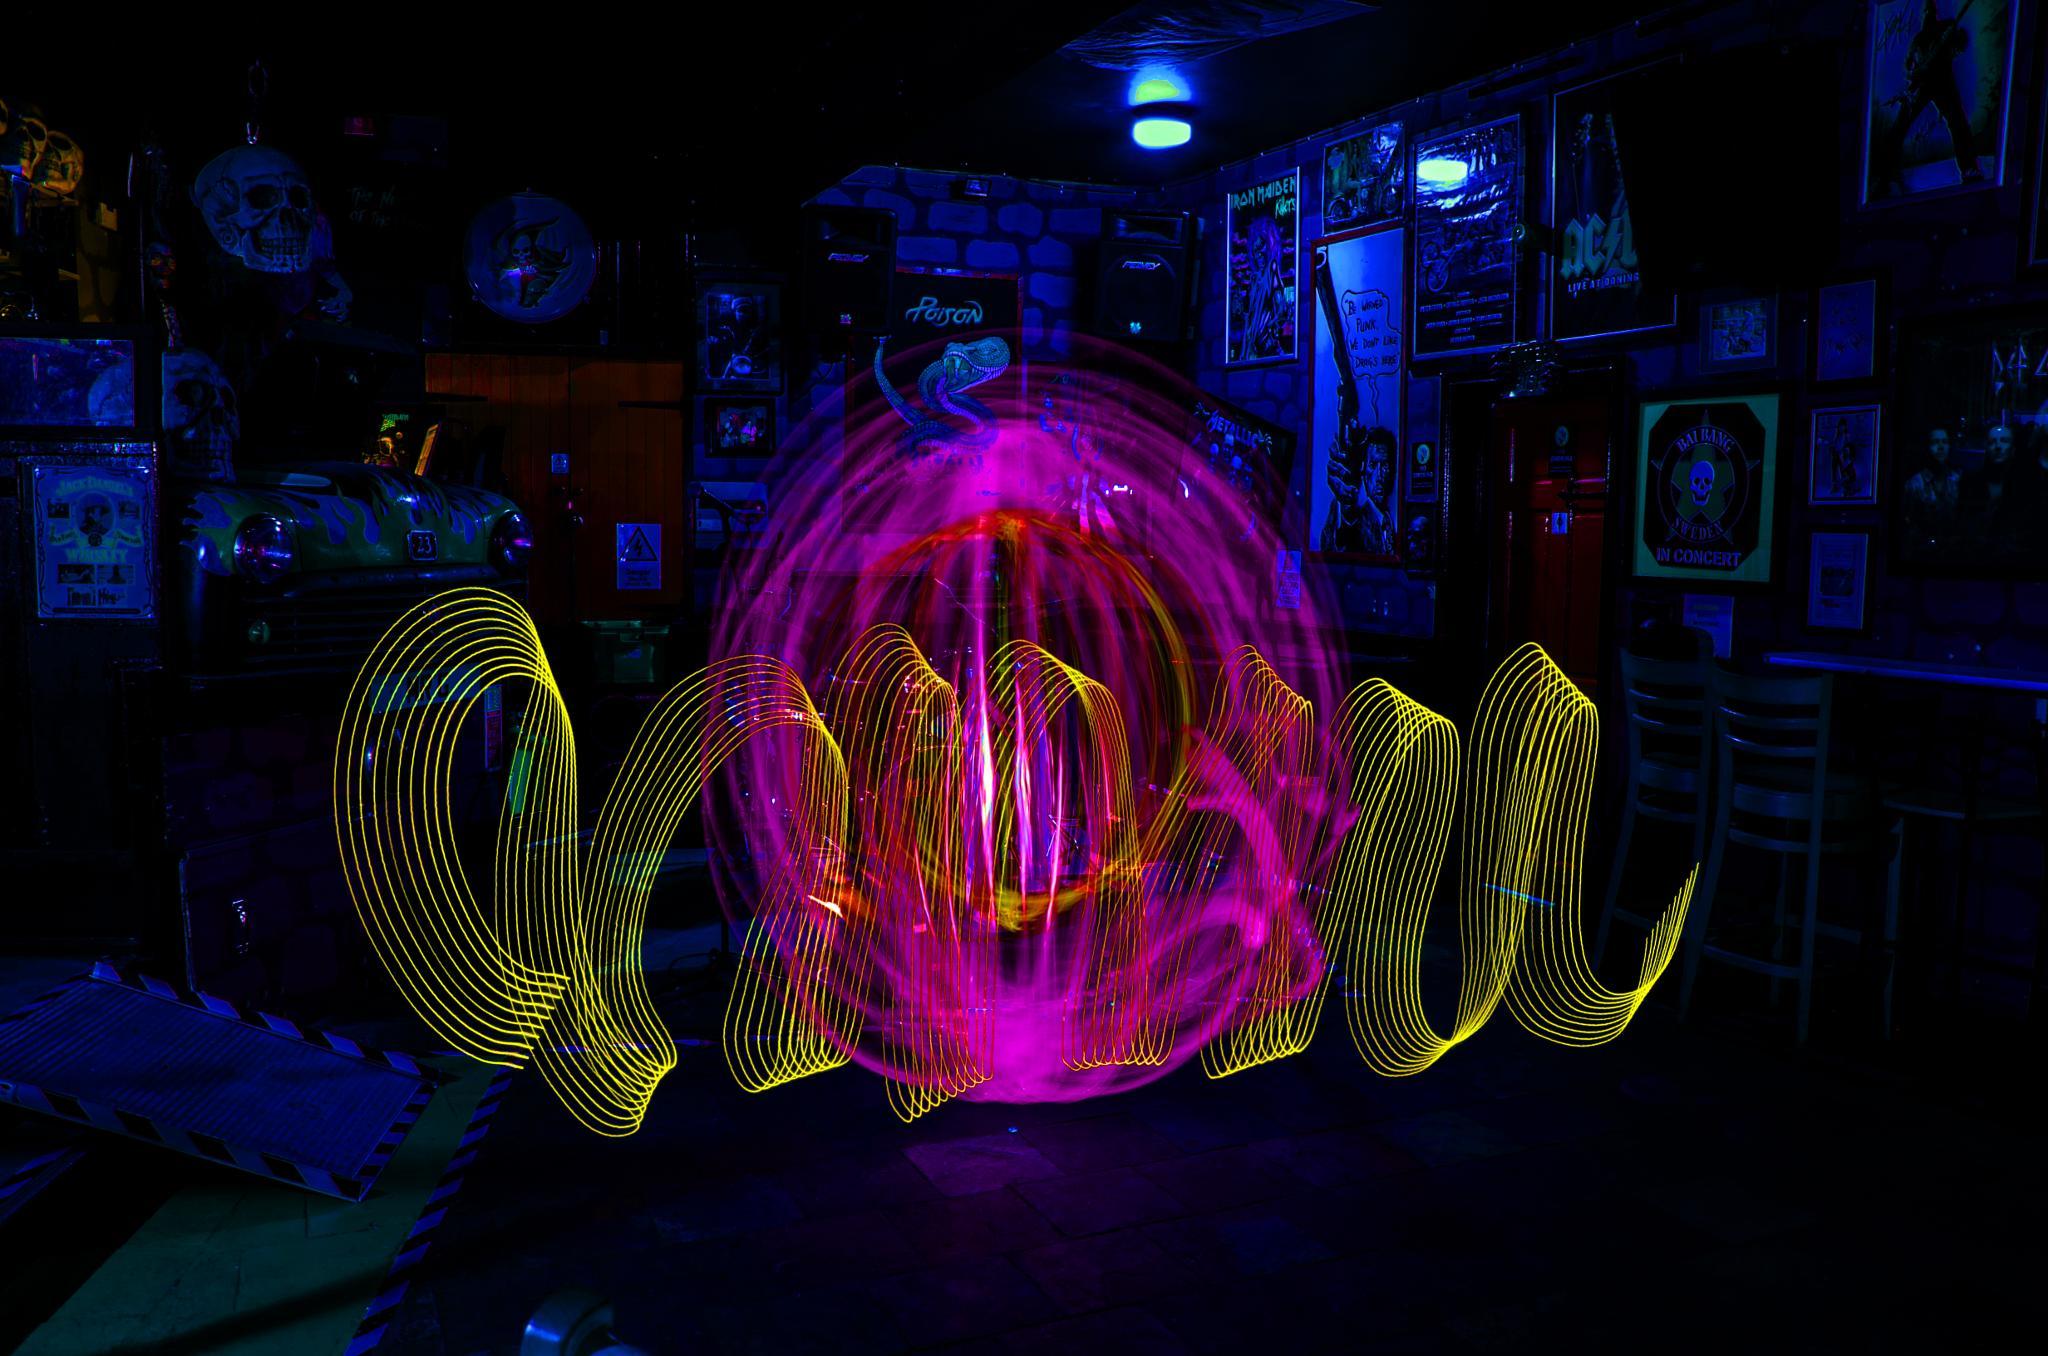 orb light painting in a pub by tobiasmaxximus